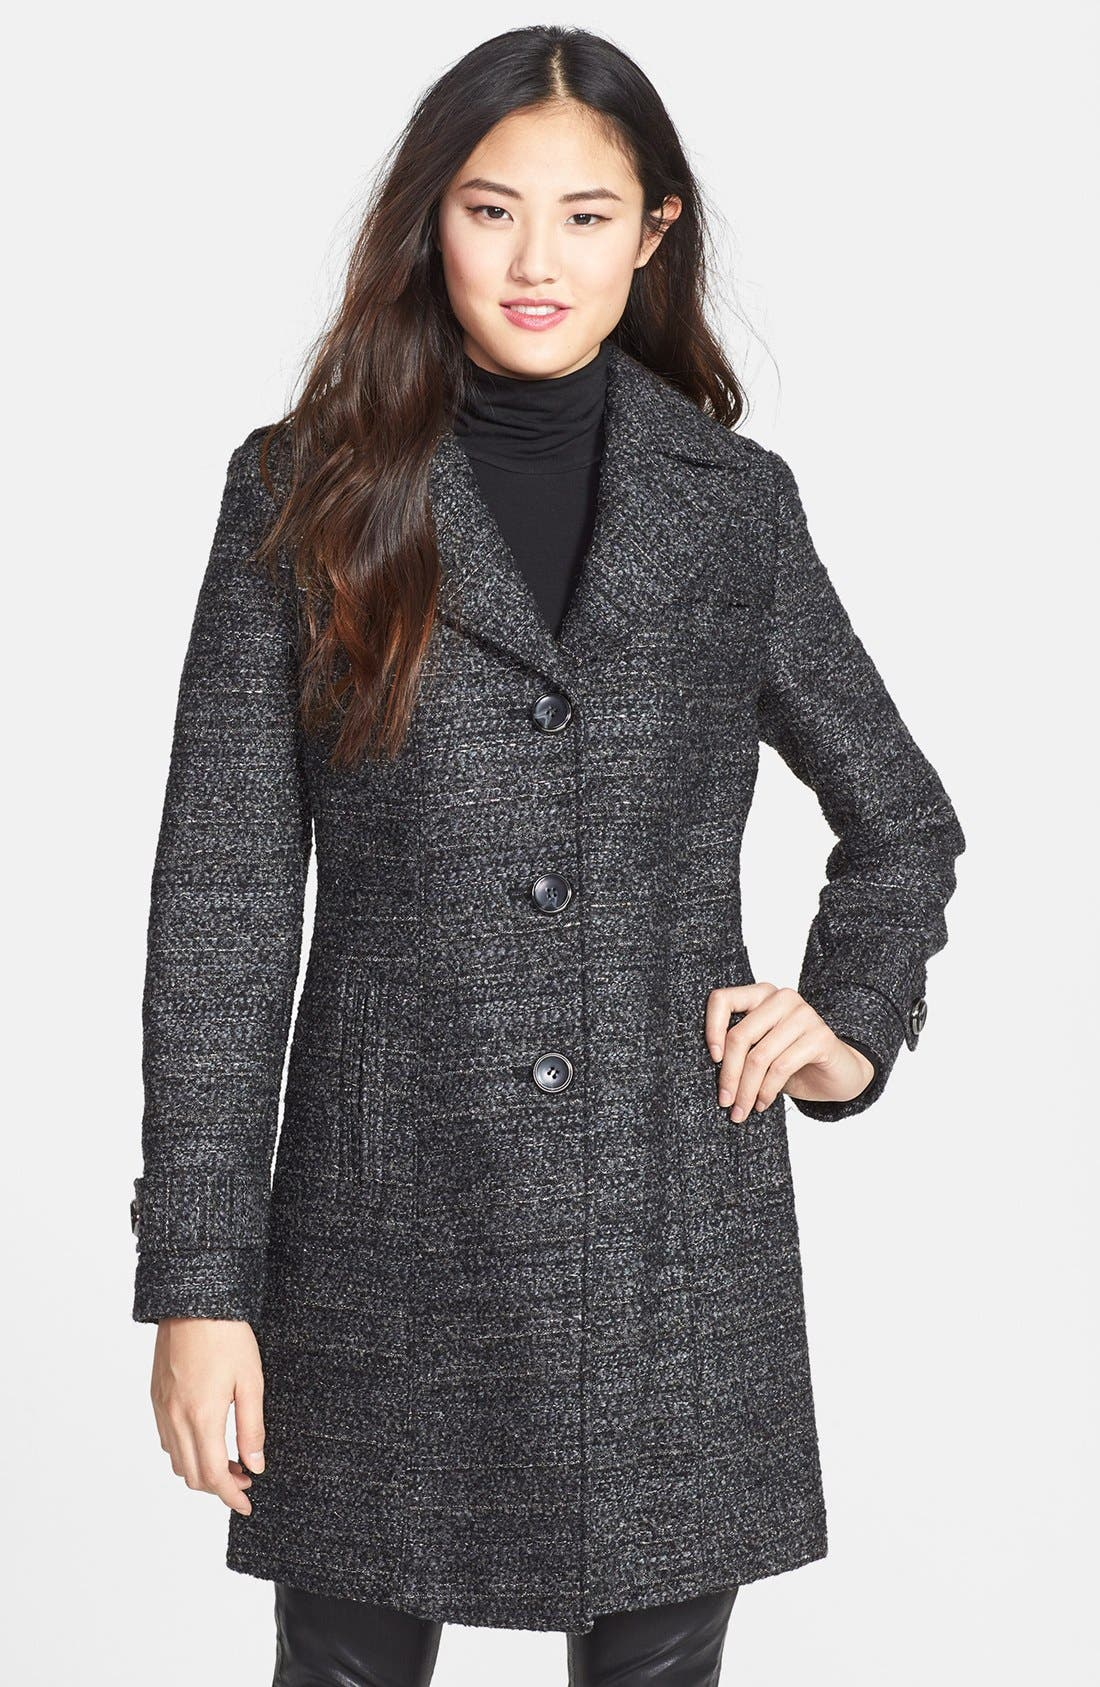 Metallic Tweed Walking Coat,                             Main thumbnail 1, color,